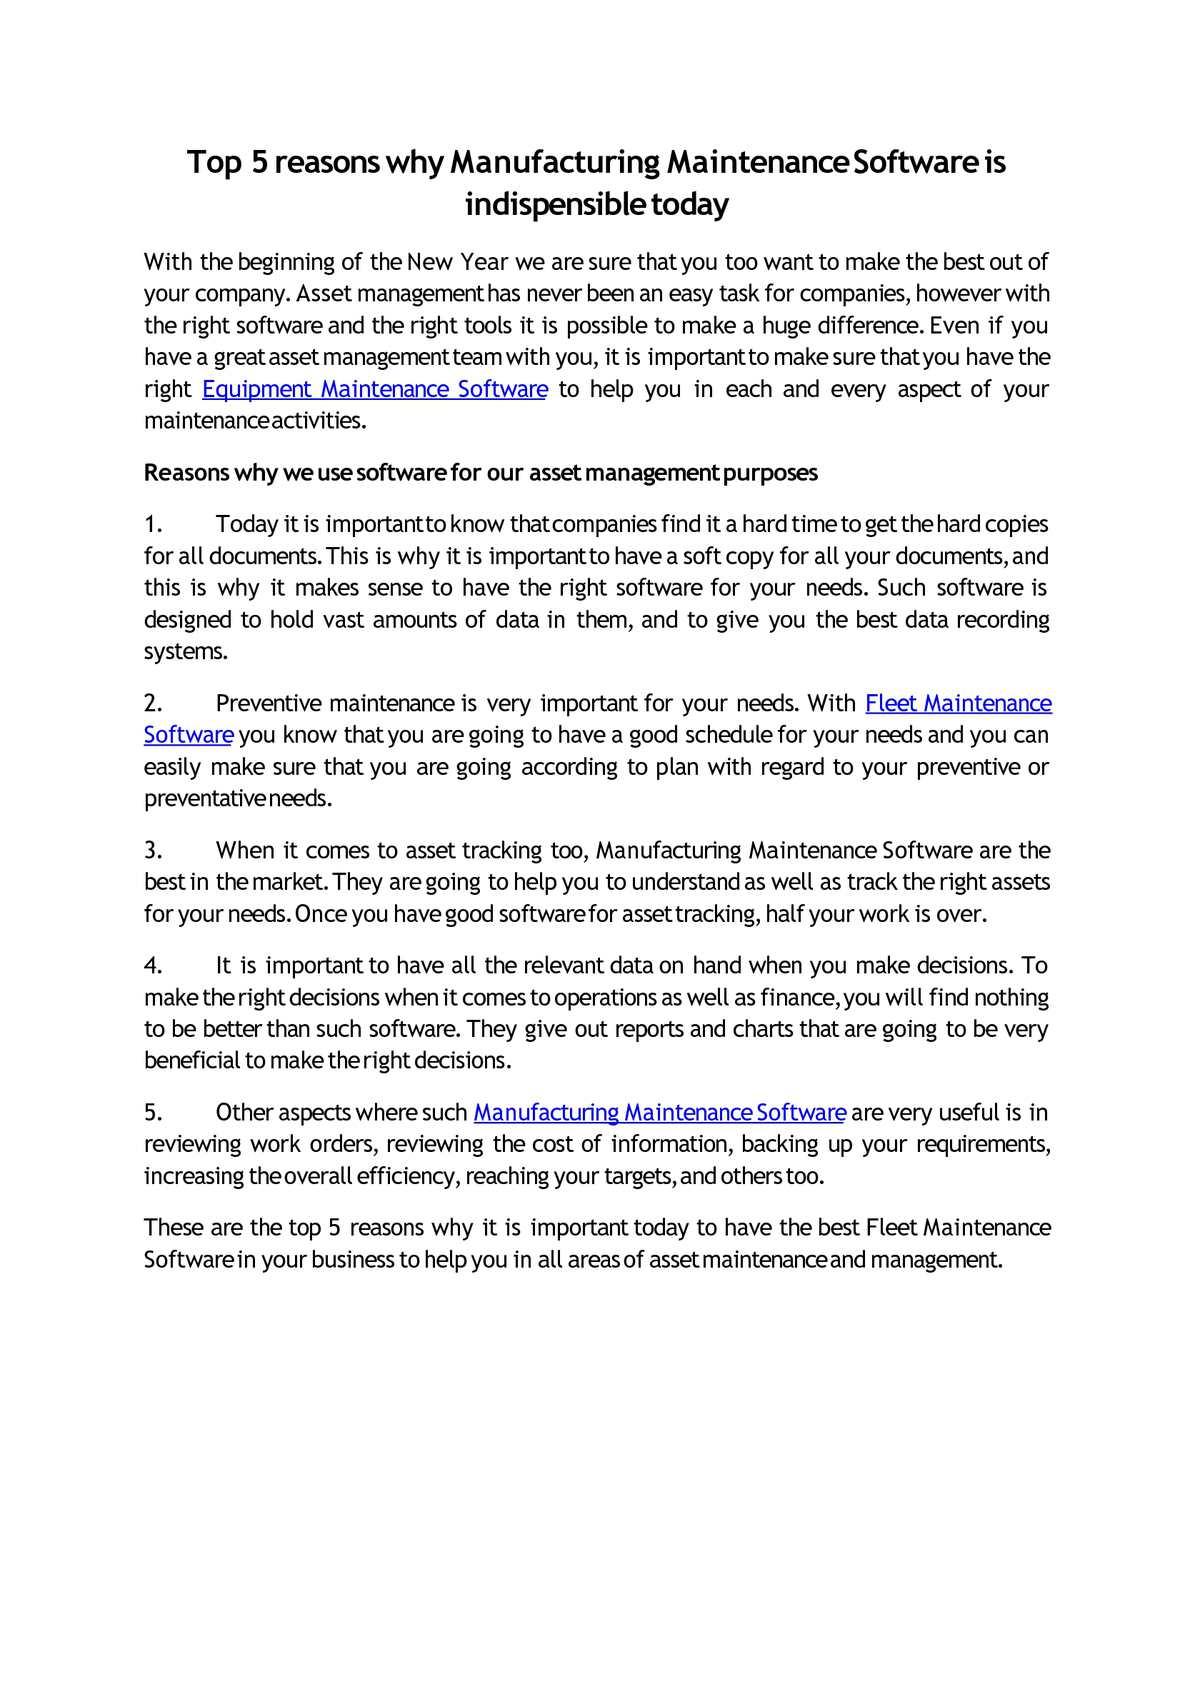 Calaméo - Top 5 reasons why Manufacturing Maintenance